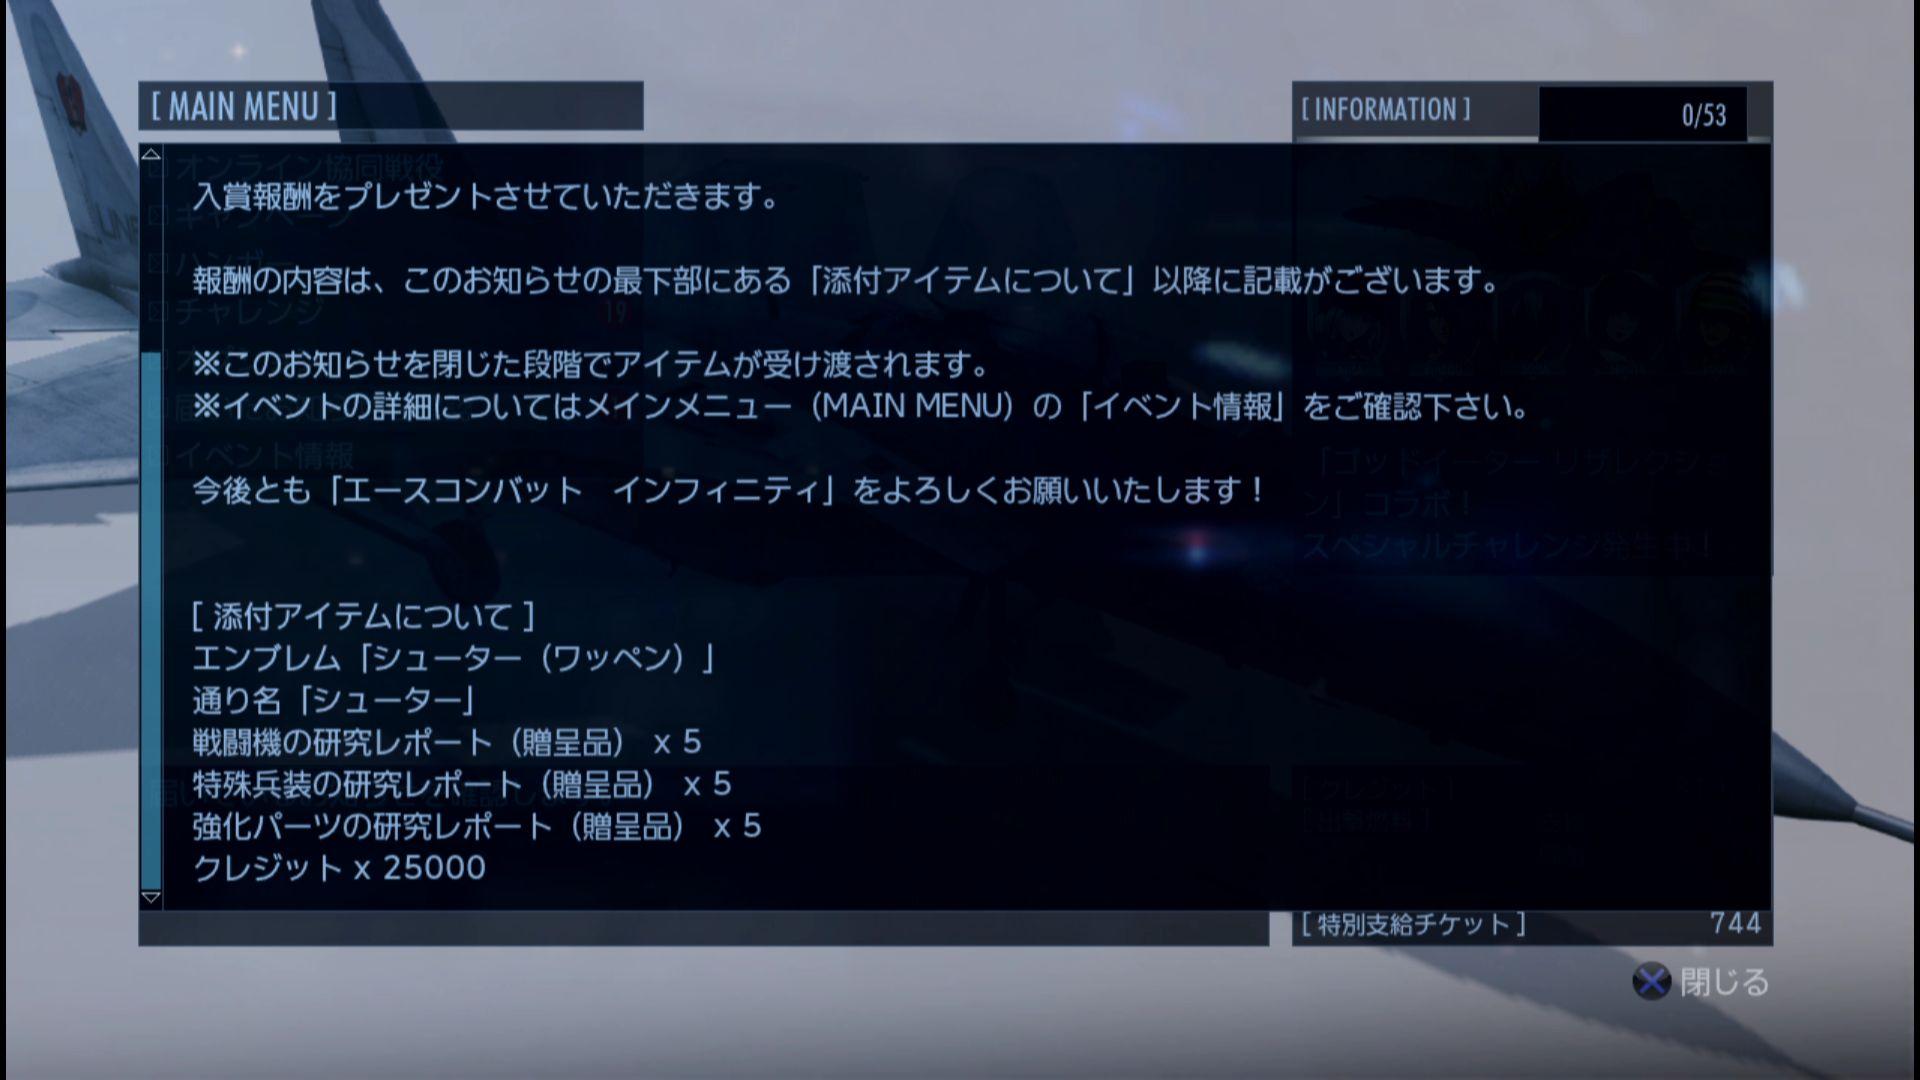 2015_11_6_1_1_44